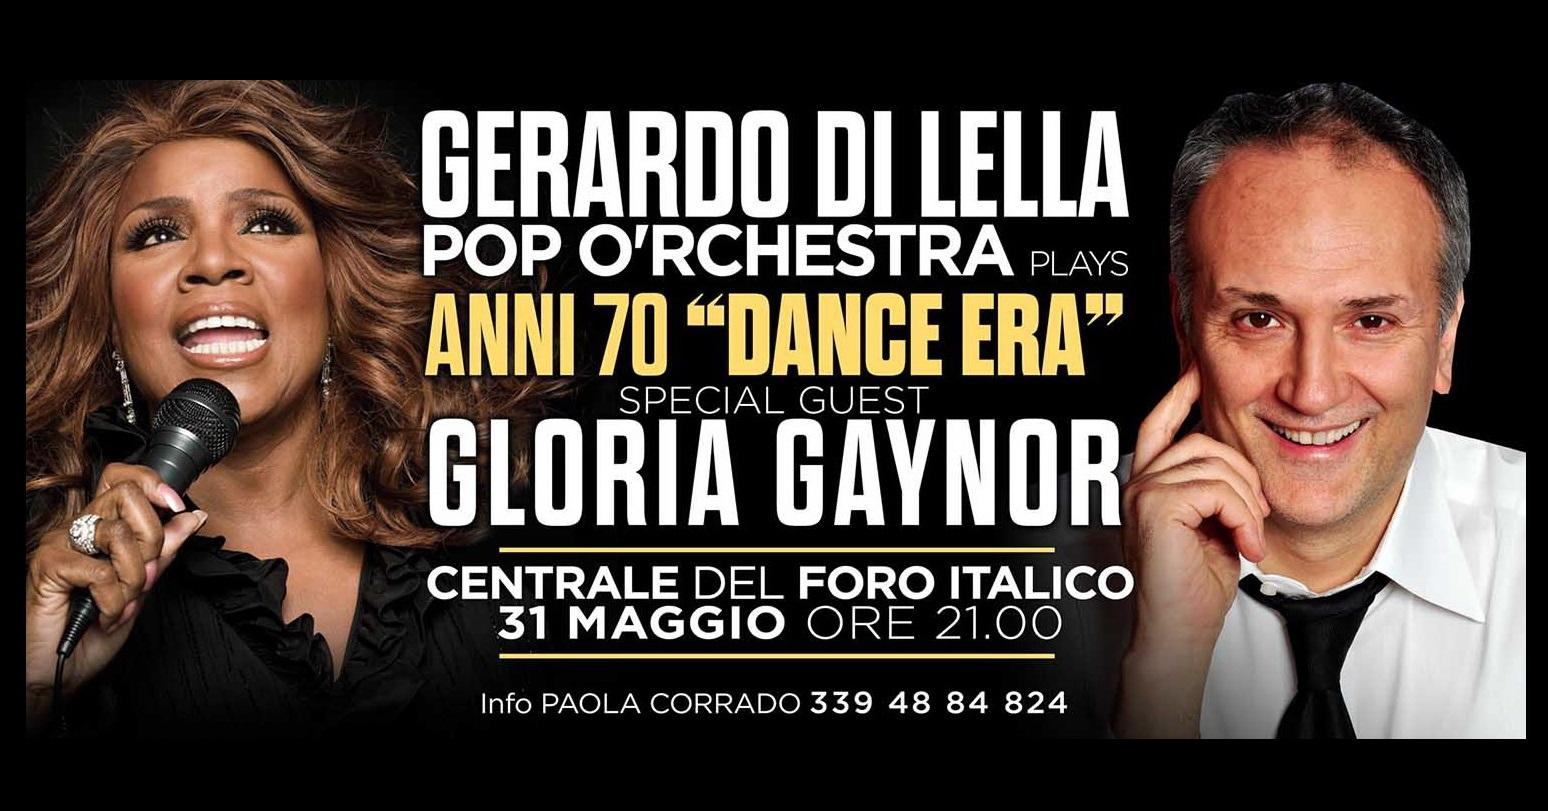 Gloria Gaynor e Pop O'rchestra Anni 70 Dance Era